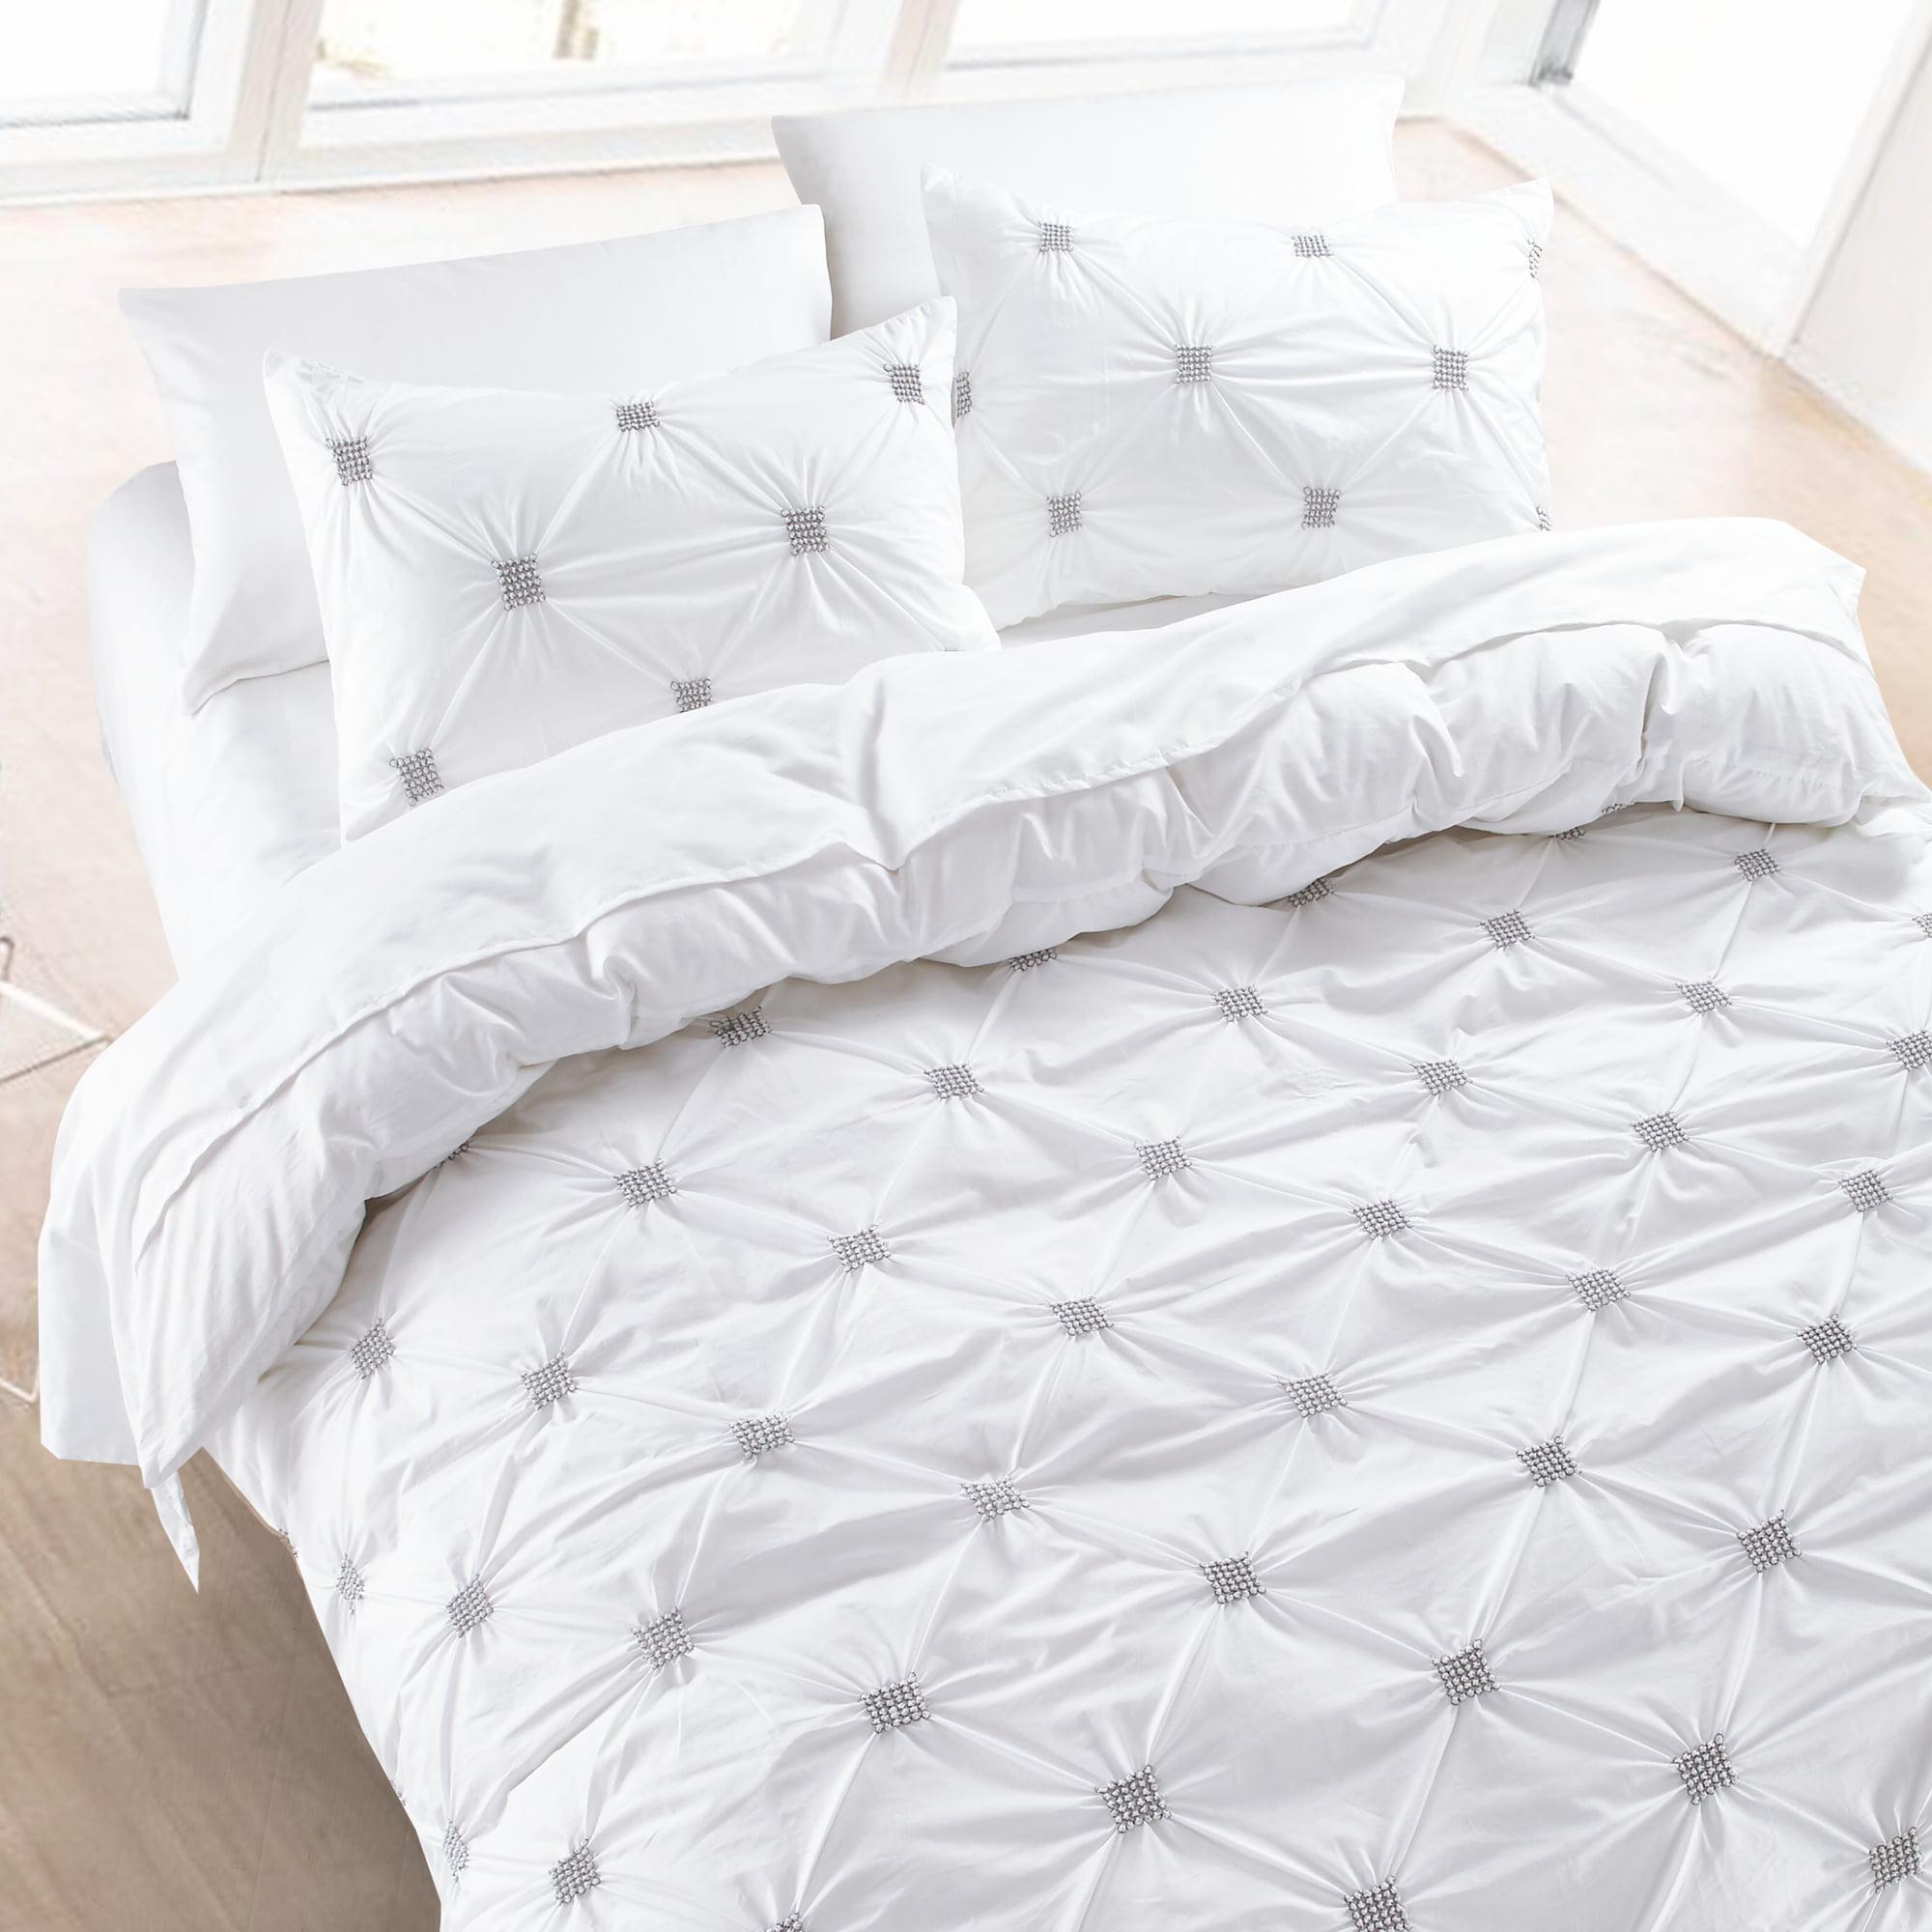 California Design Den Diamond Pintuck Duvet Cover Set Cotton Charcoal, Full/Queen 3-Piece